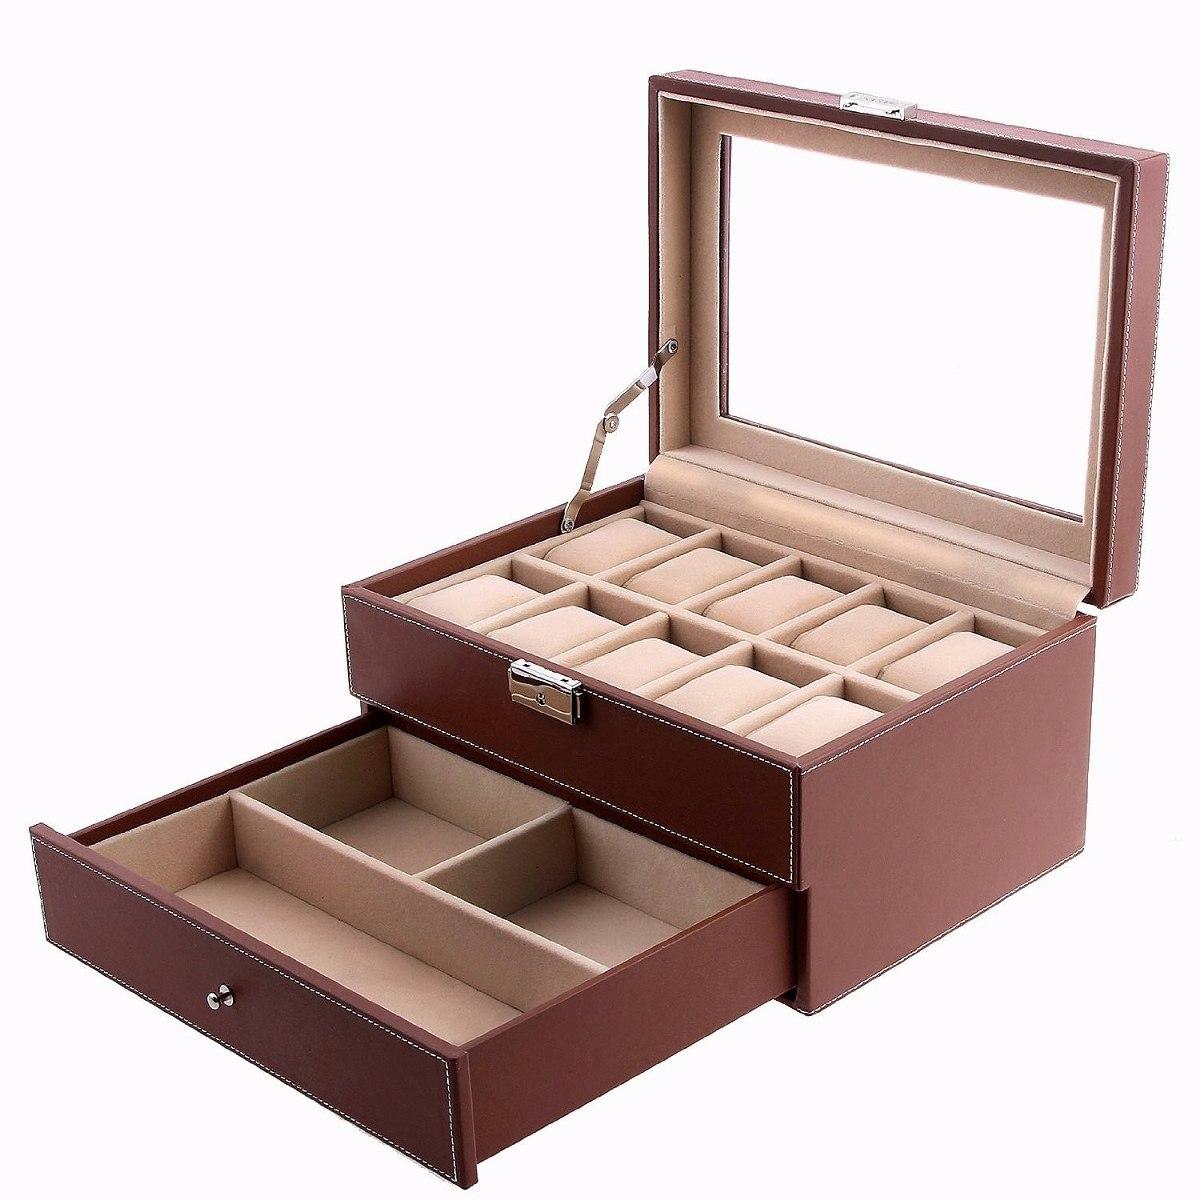 e1eb3630e7ff estuche almacenar joyeria caja para joyas imitacion piel. Cargando zoom.